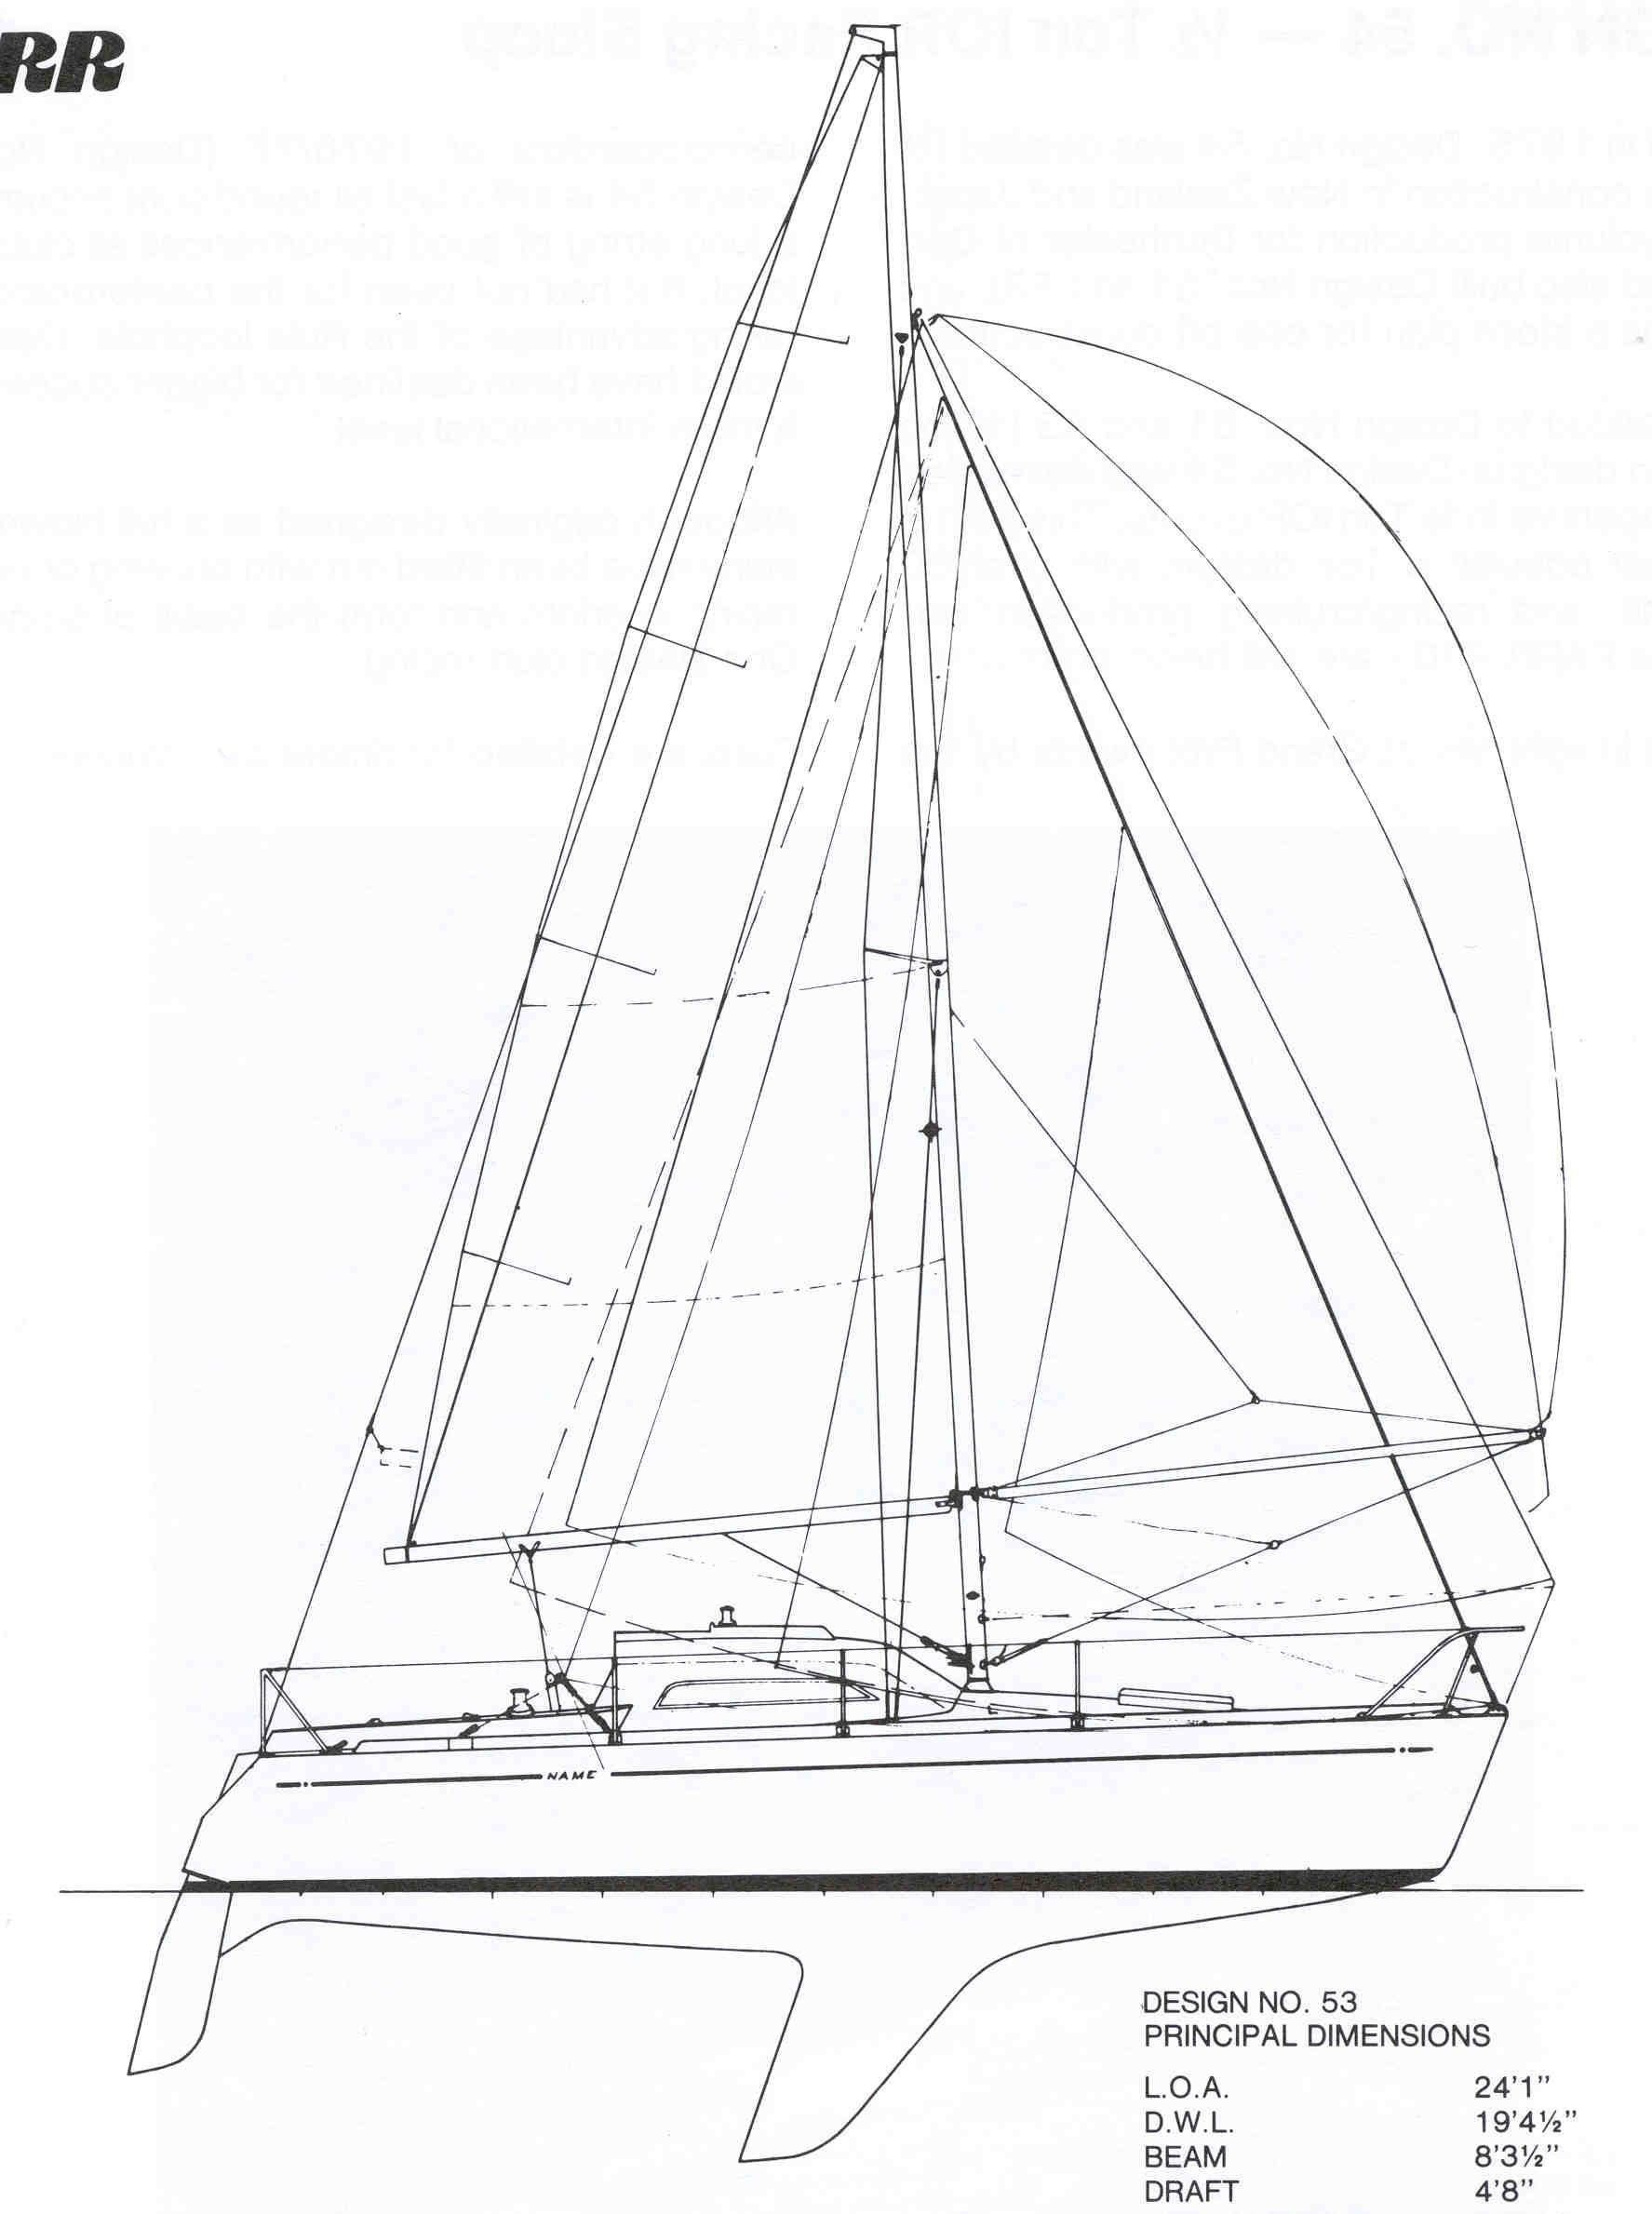 fyd 1 4 ton ior racing sloop design 53